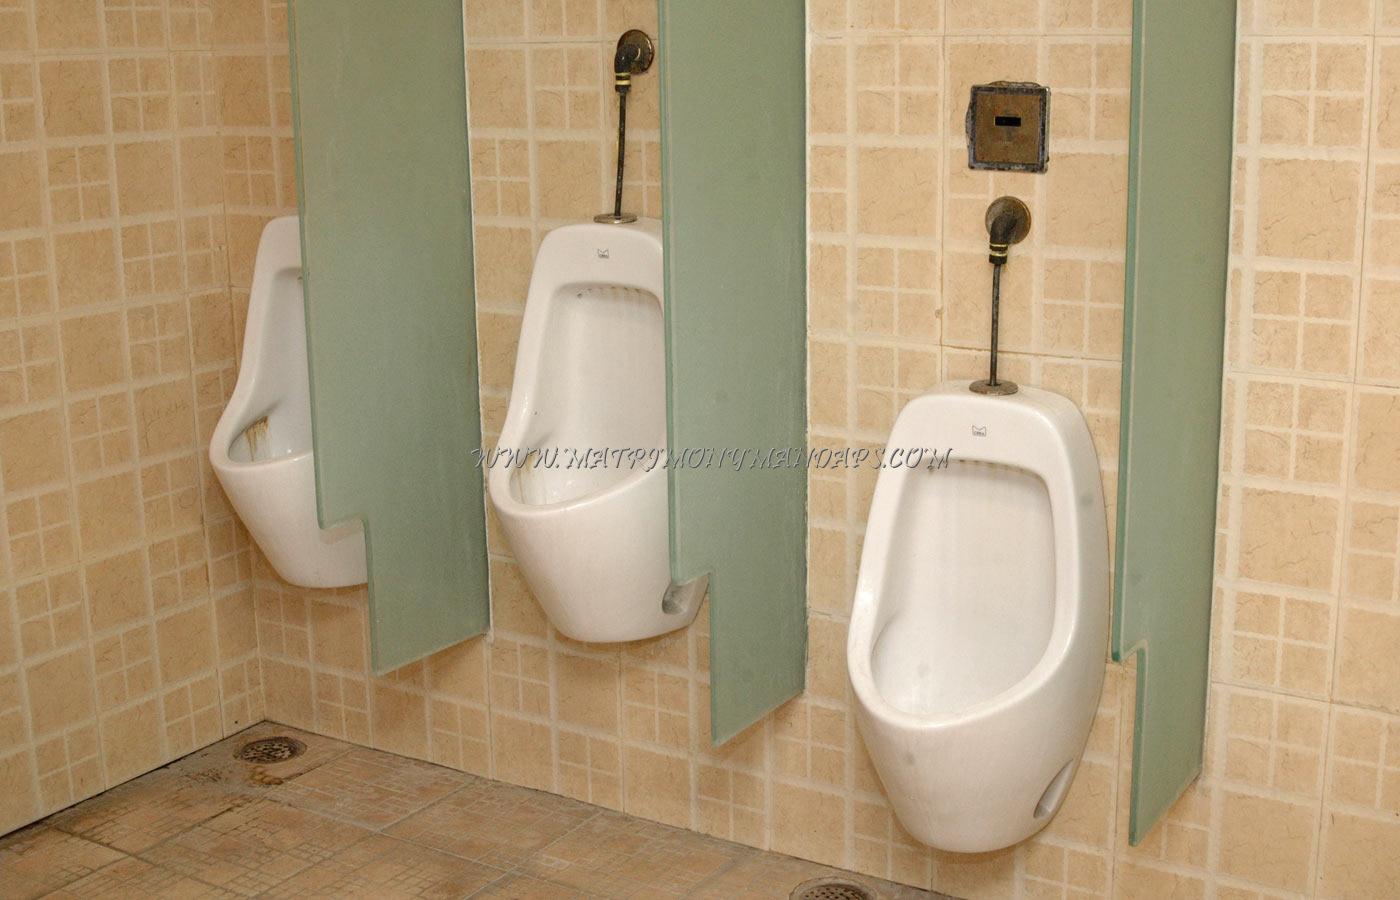 Chutneys Banquet Hall 1 - Restrooms